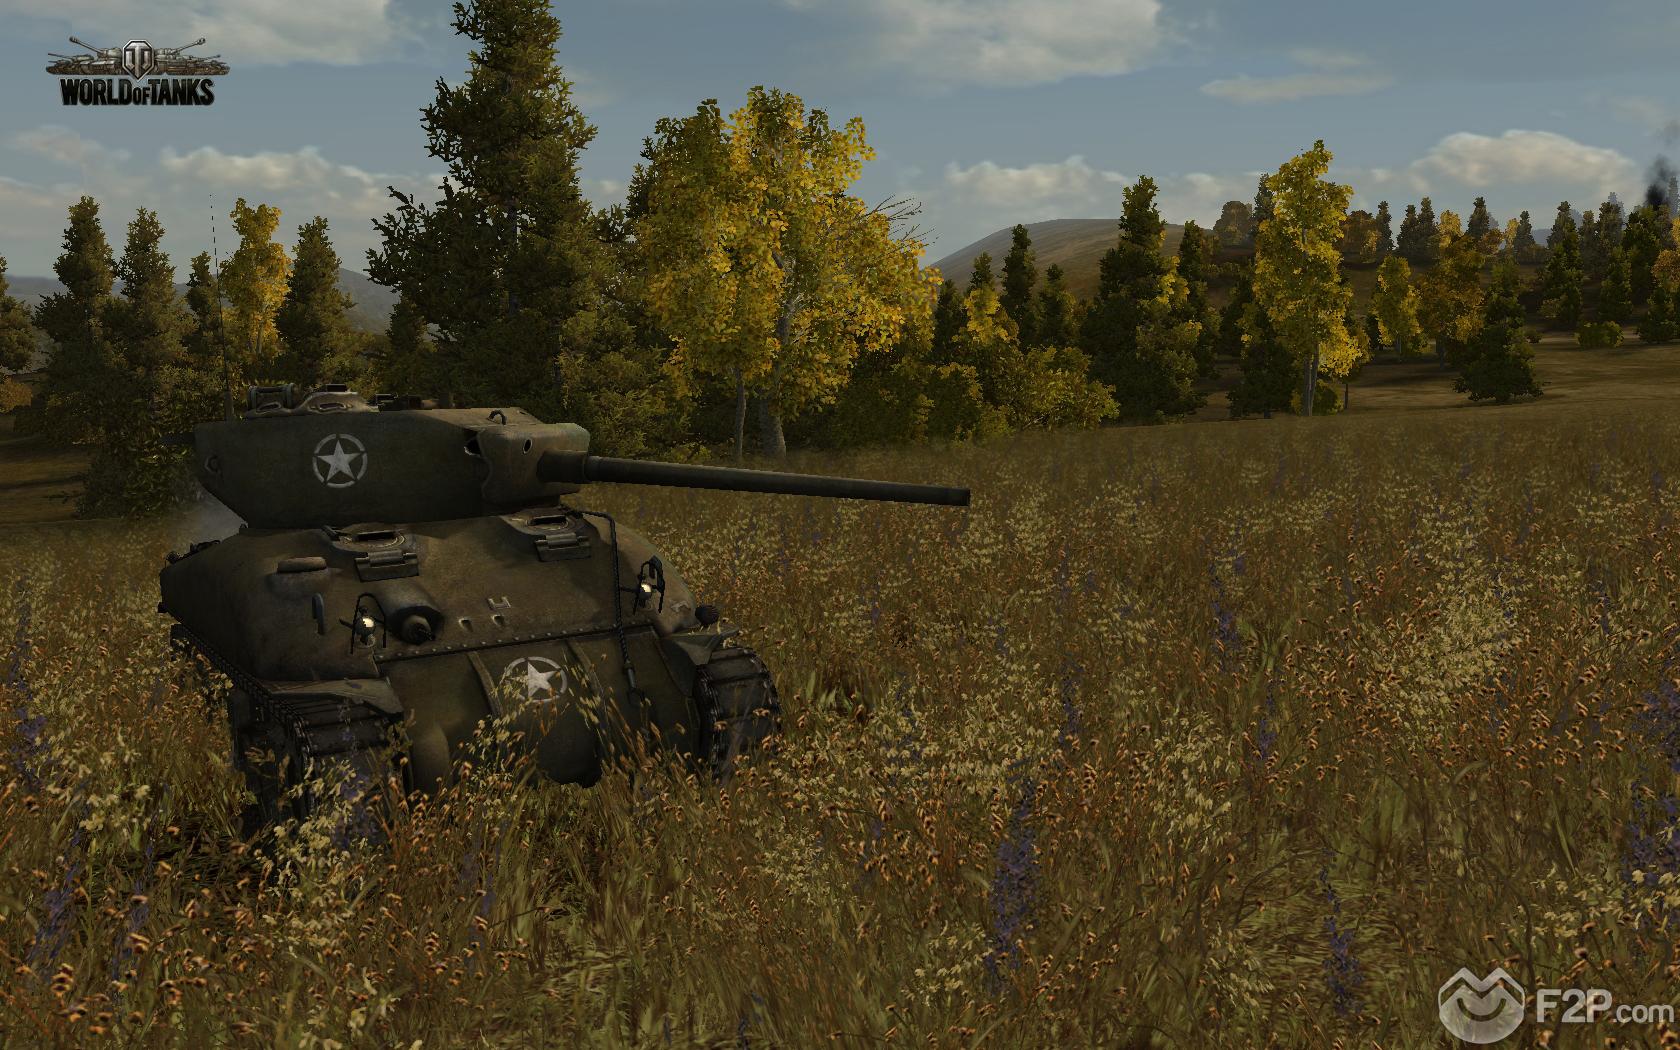 Click image for larger version.Name:World of Tanks 62.jpgViews:133Size:1.73 MBID:3844